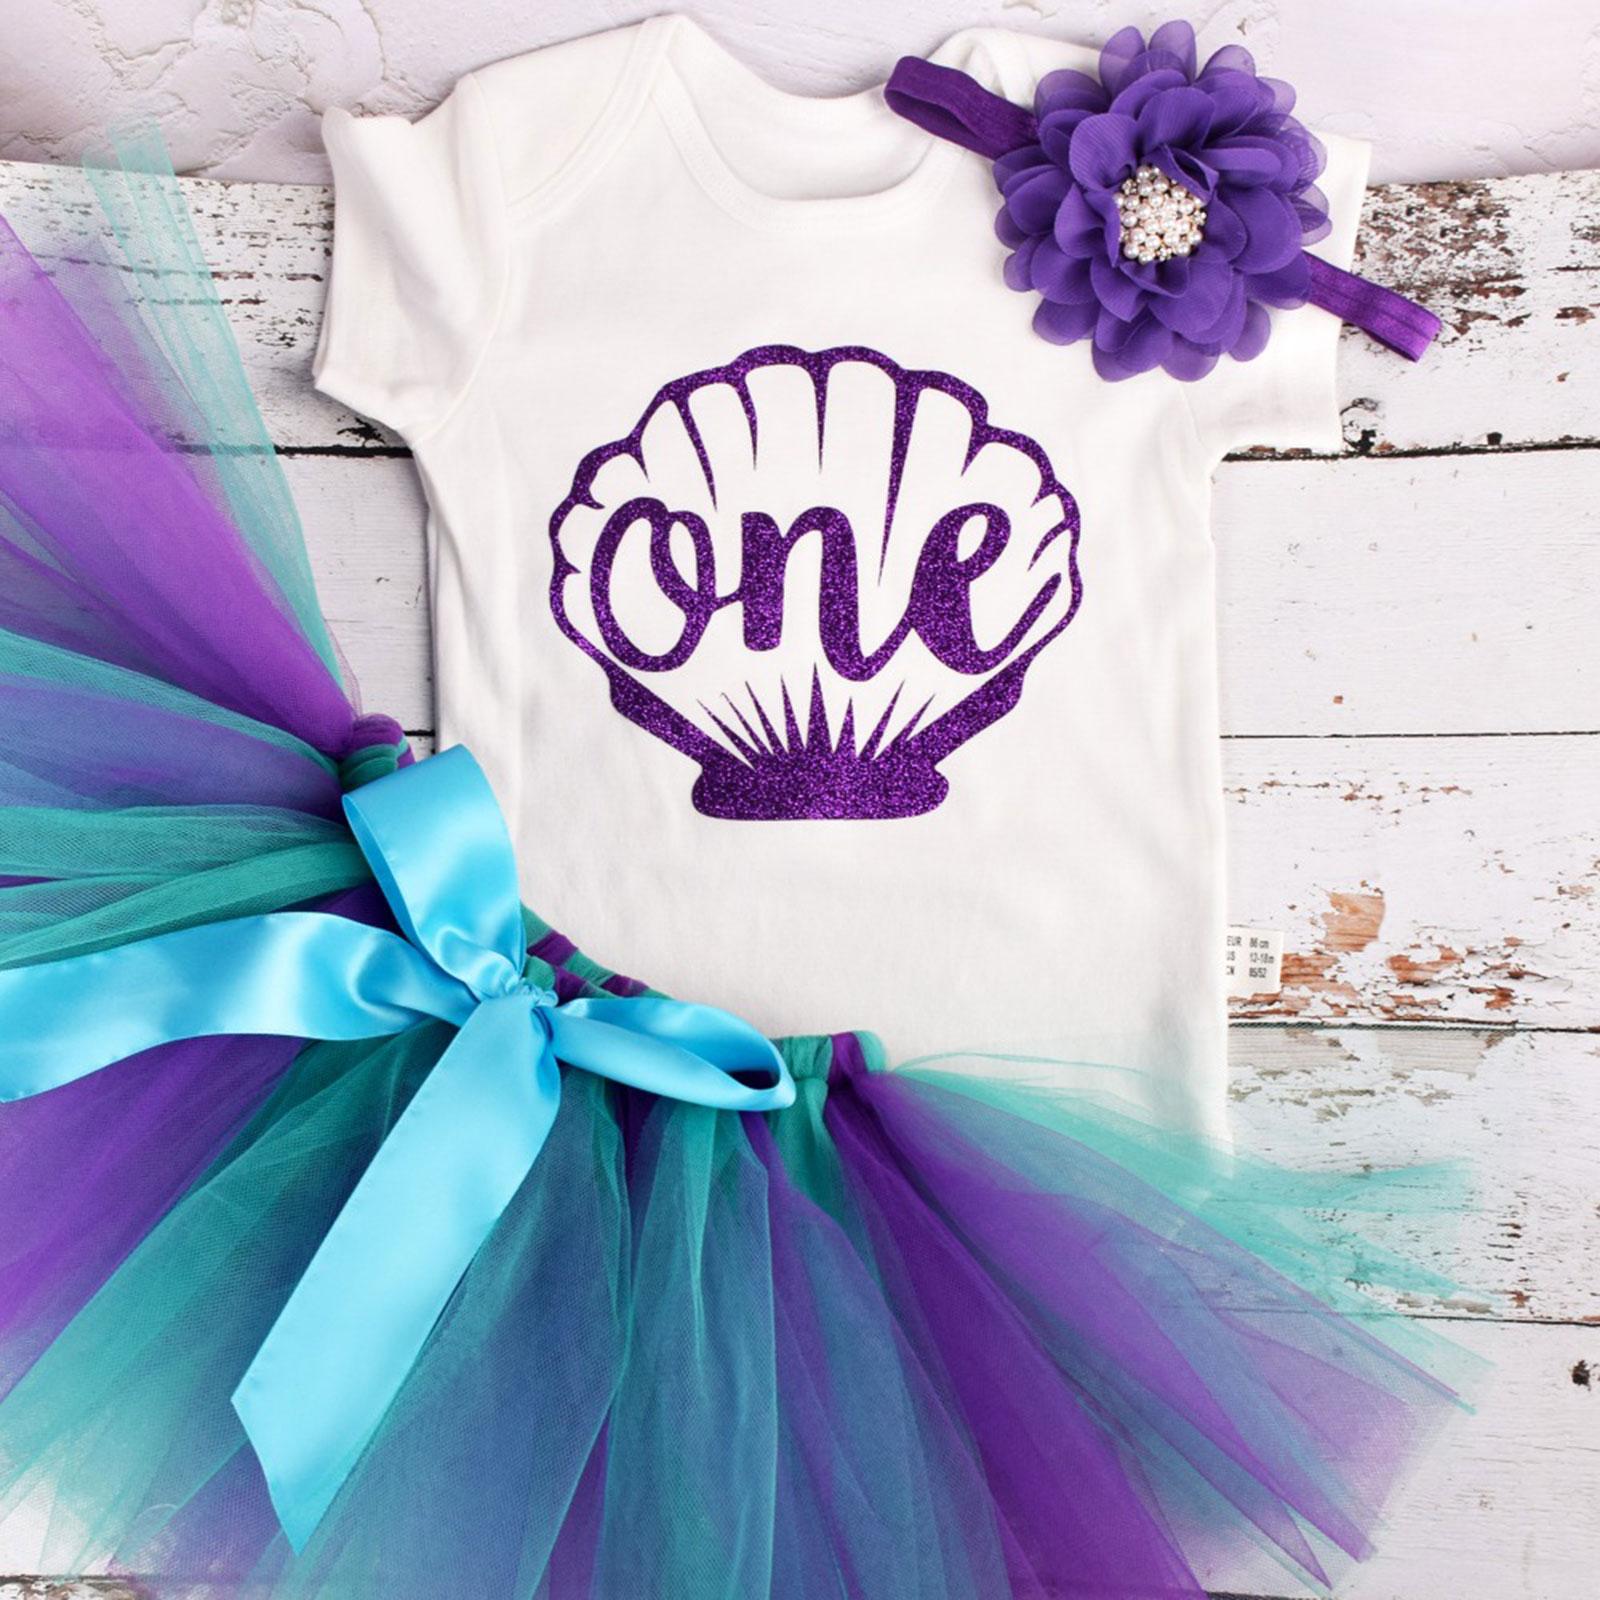 Baby Girl Mermaid Costumes Short Sleeves Romper Mesh Skirt with Flower Headband Halloween Cosplay Bi